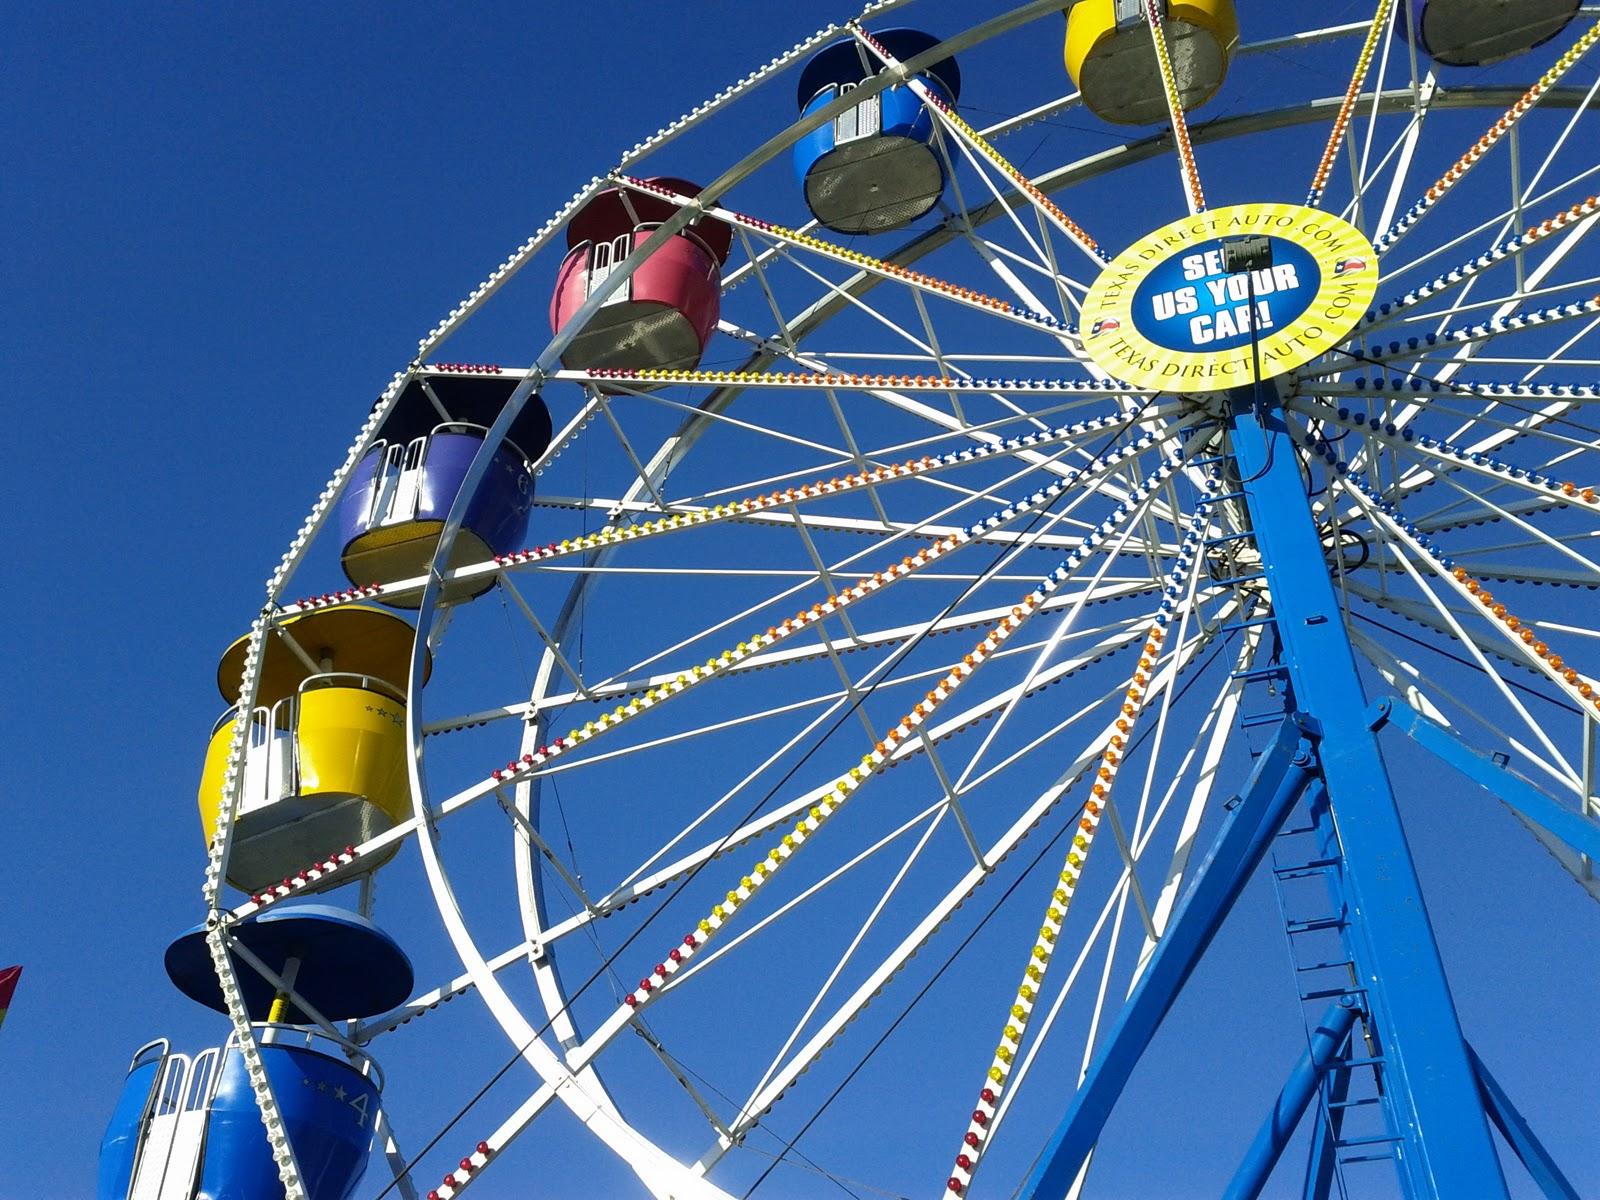 Fort Bend County Fair 2011 - IMG_20111001_174418.jpg